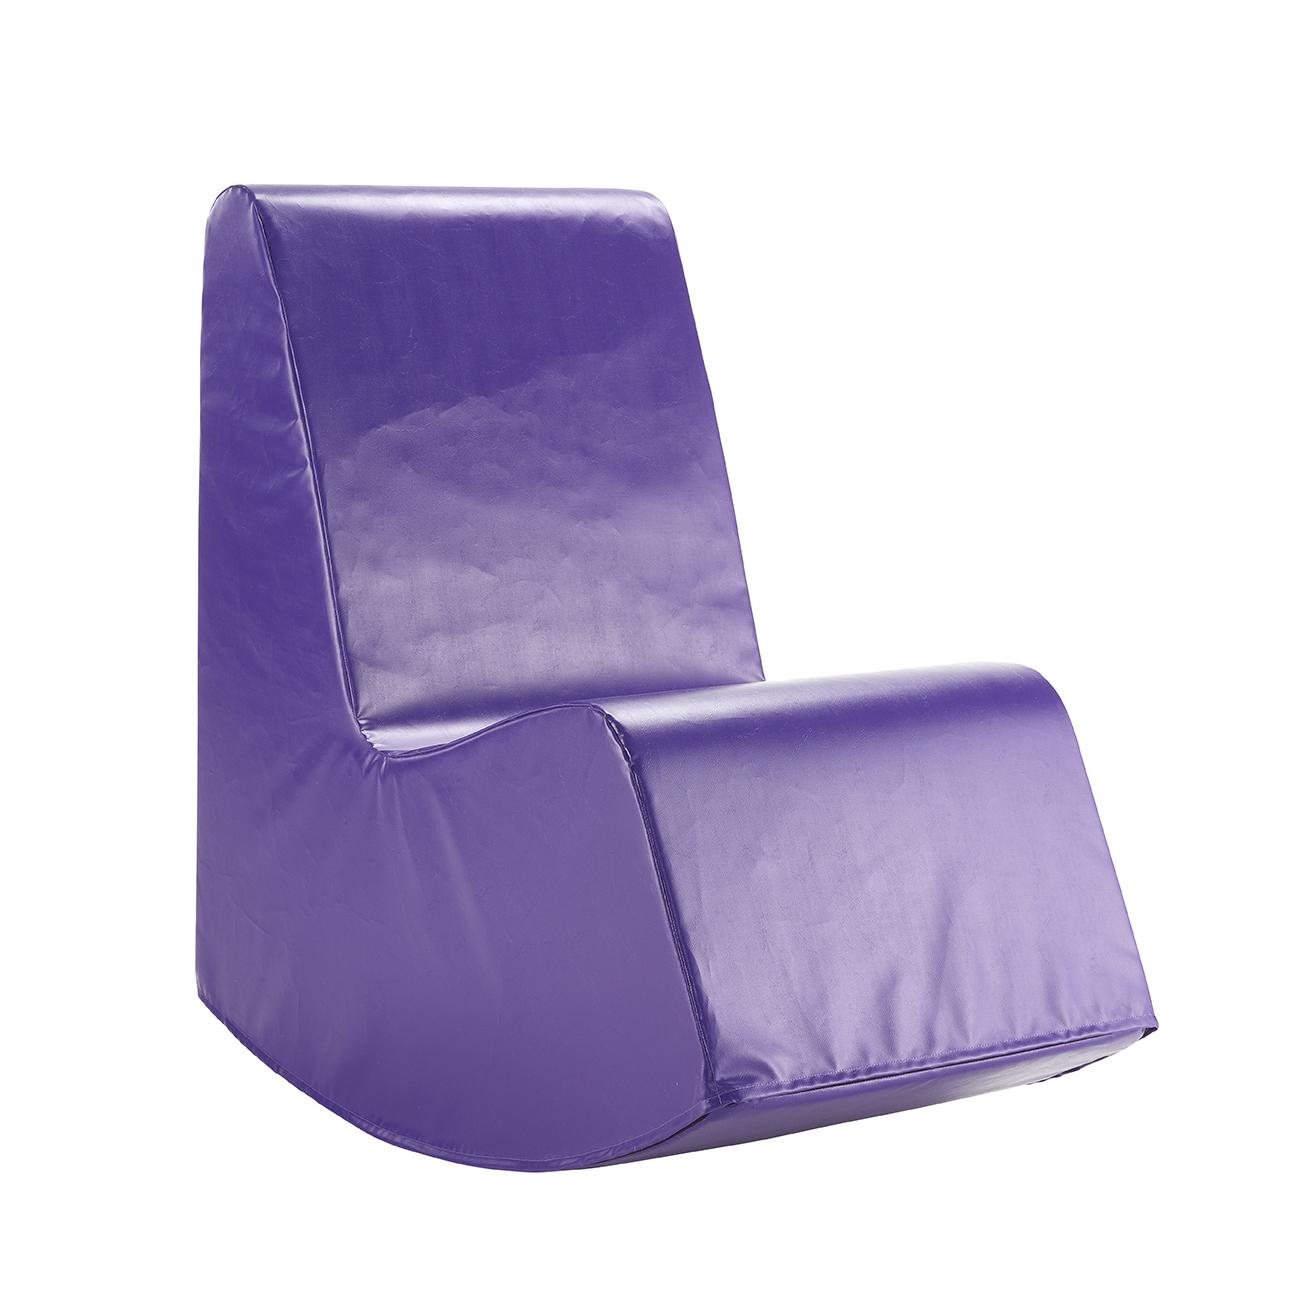 Swell Glyss Foam Rocking Chair Knightsbridge Furniture Uwap Interior Chair Design Uwaporg